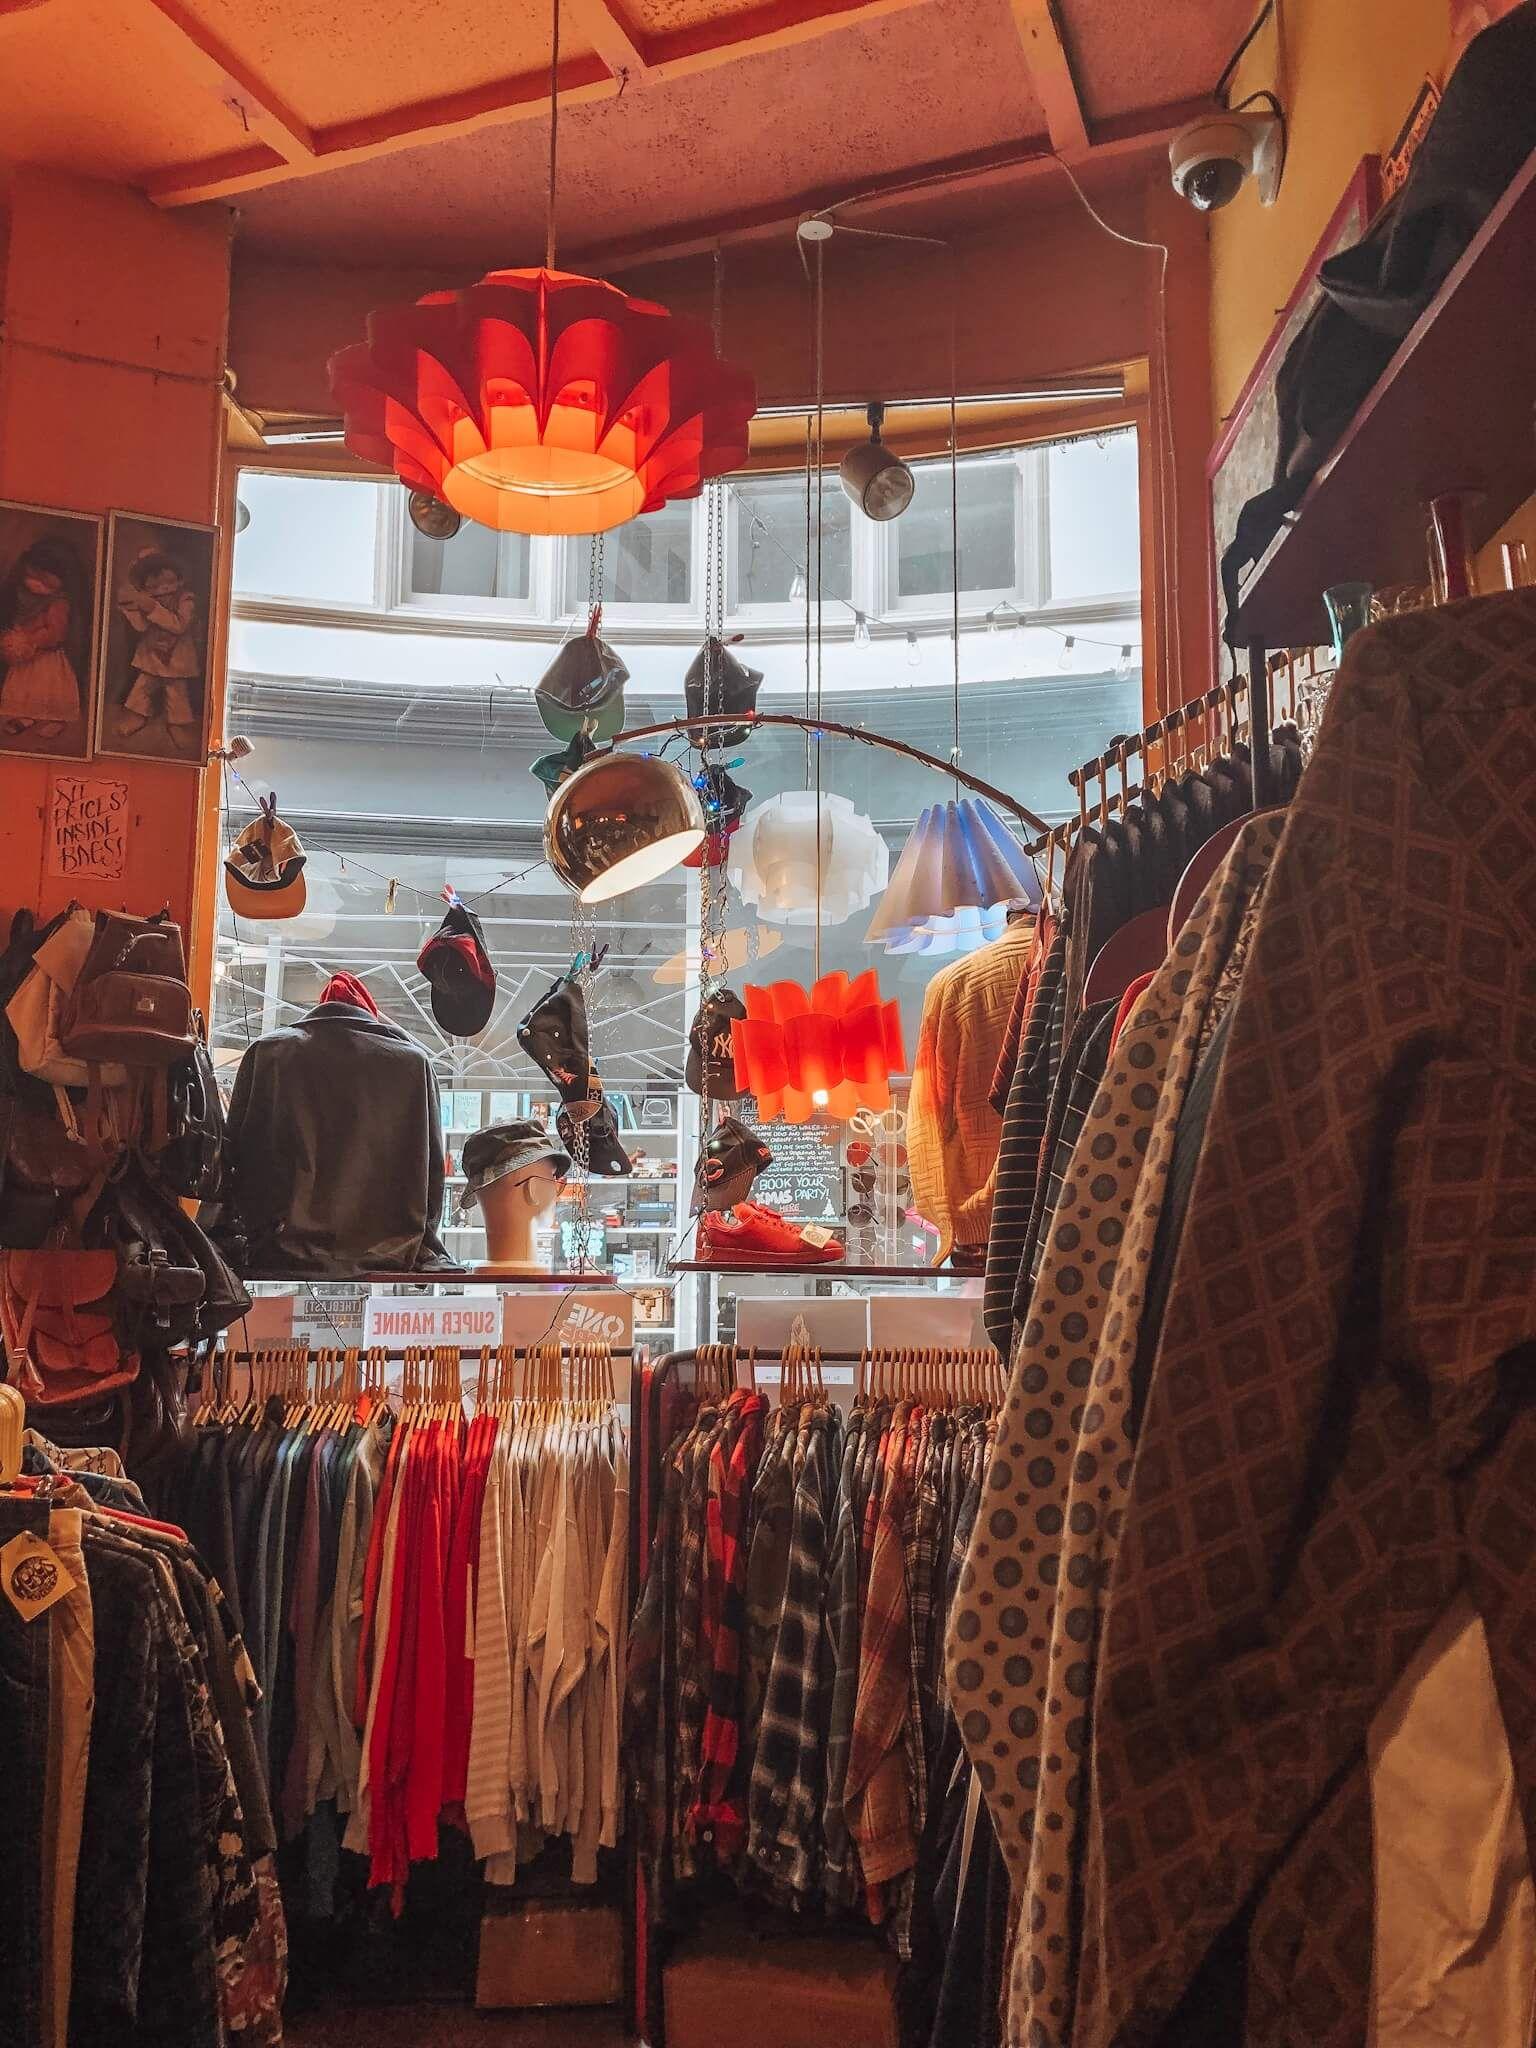 Image may contain: Wildlife, Mammal, Giraffe, Animal, Person, Human, Boutique, Market, Bazaar, Clothing, Apparel, Shop